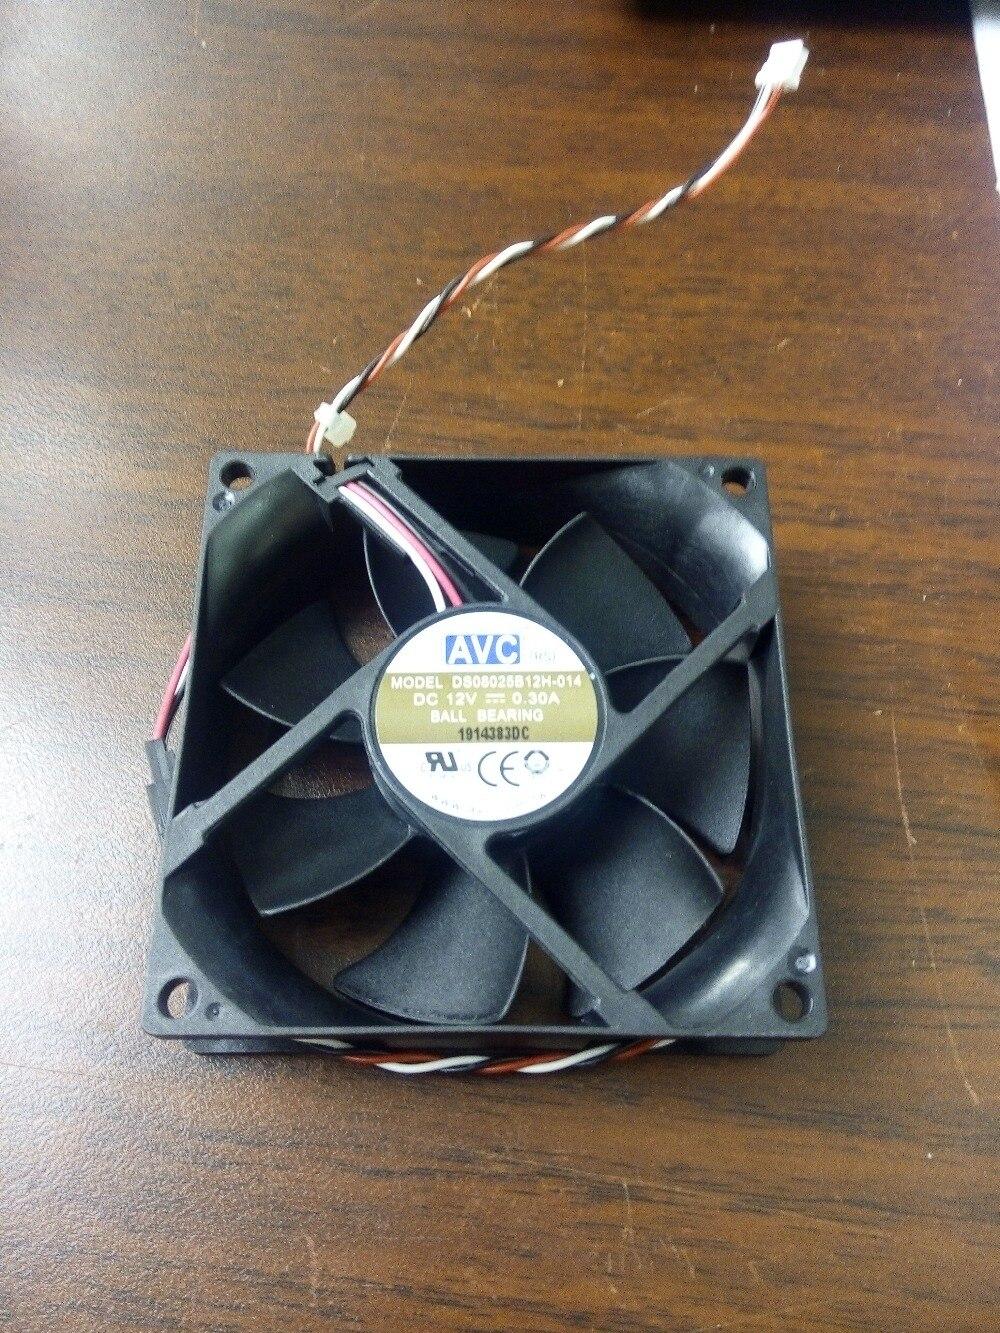 90% YENI Q5669-60664 Vakum aerosol fan assy DesignJet T610 T1100 Z2100 Z3100 ploter parçaları